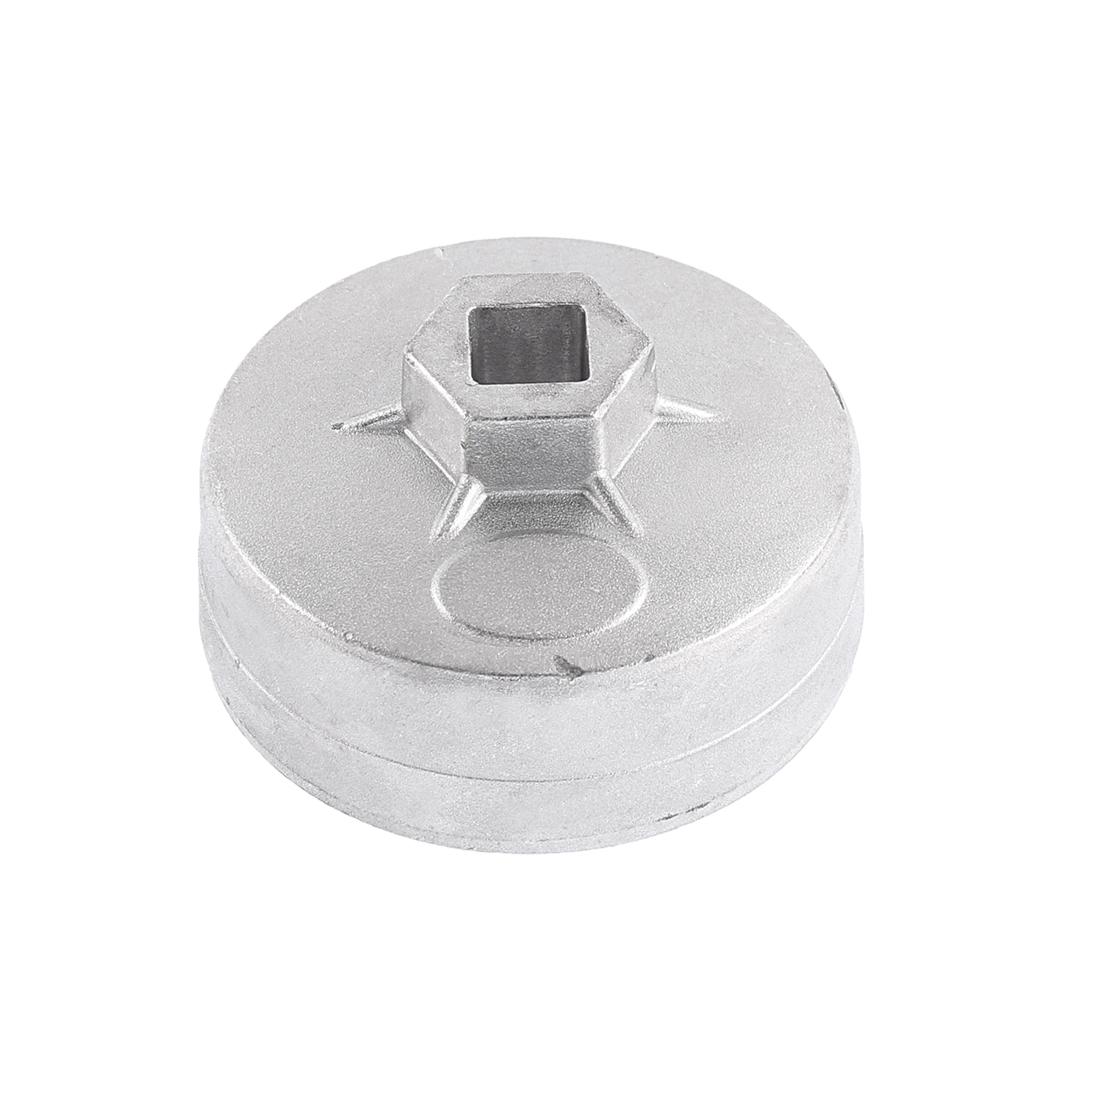 75mm Inner Dia 15 Flutes Cap Oil Filter Wrench Socket Remover Tool for Car